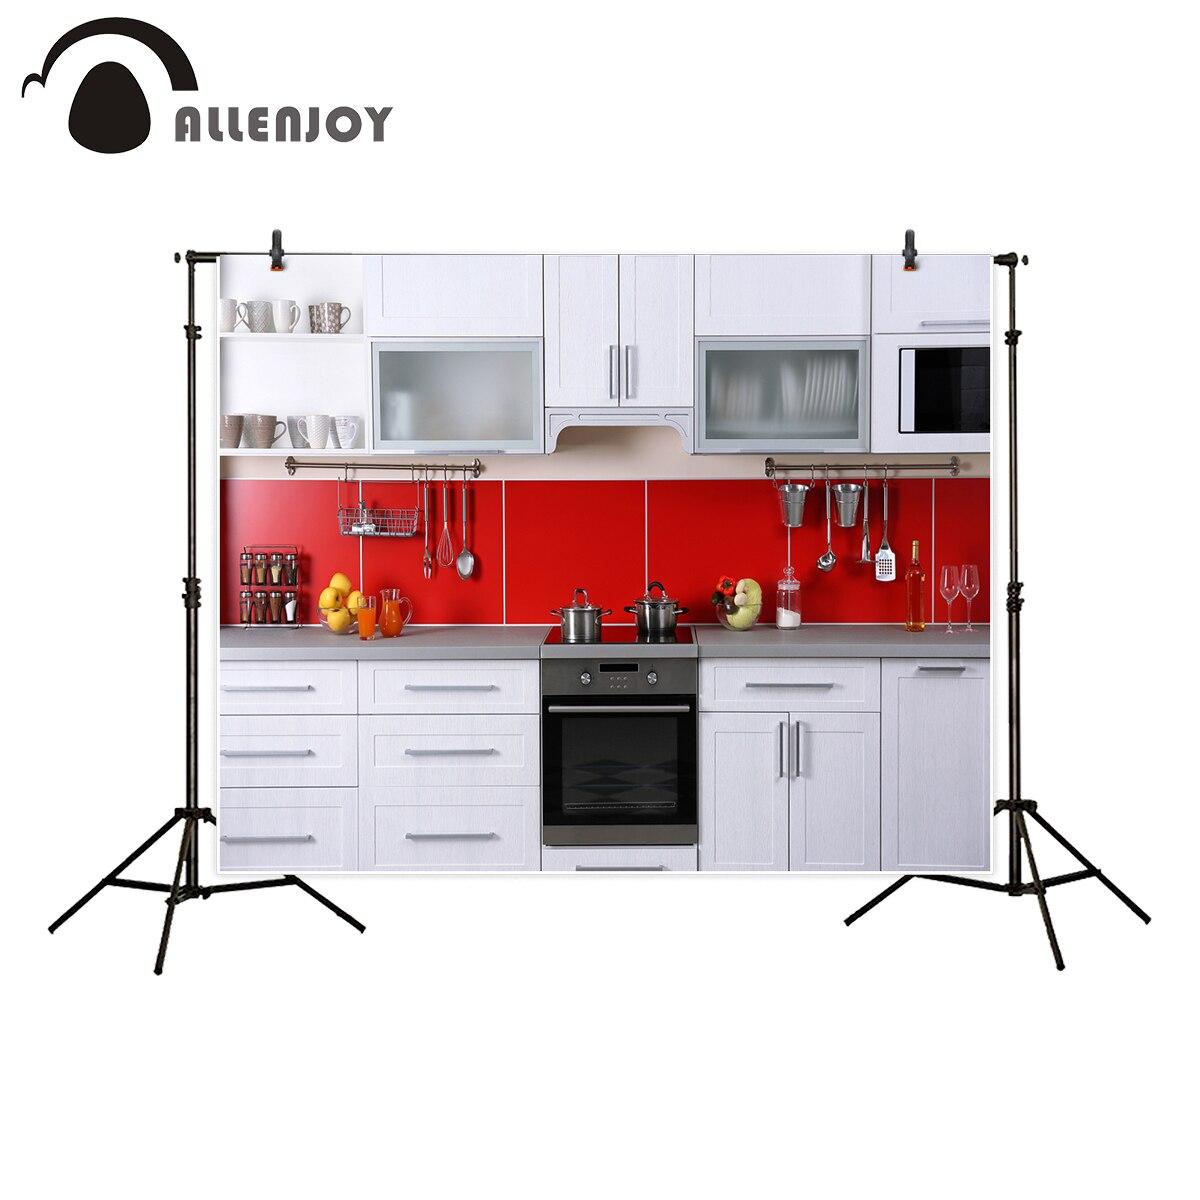 Modern Kitchen Red: Allenjoy Backdrop For Photography Studio Modern Kitchen